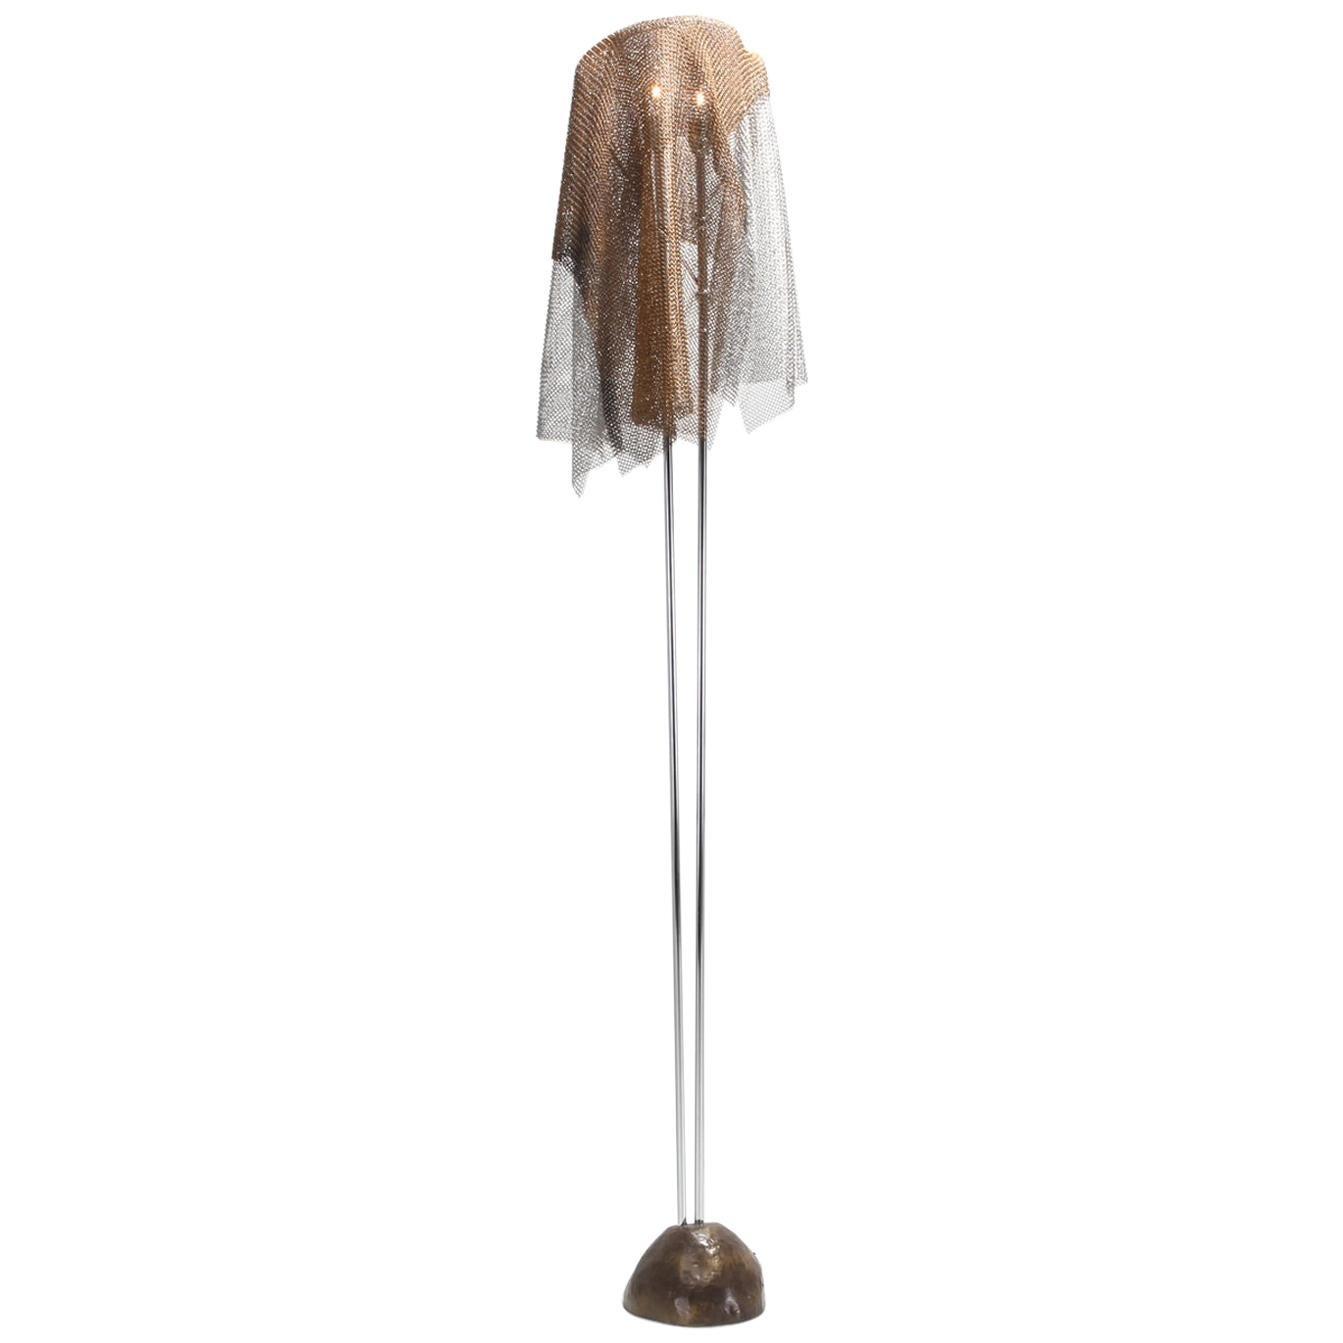 "Artemide Chain Mail Floor Lamp ""Anchise"" by Toni Cordero"